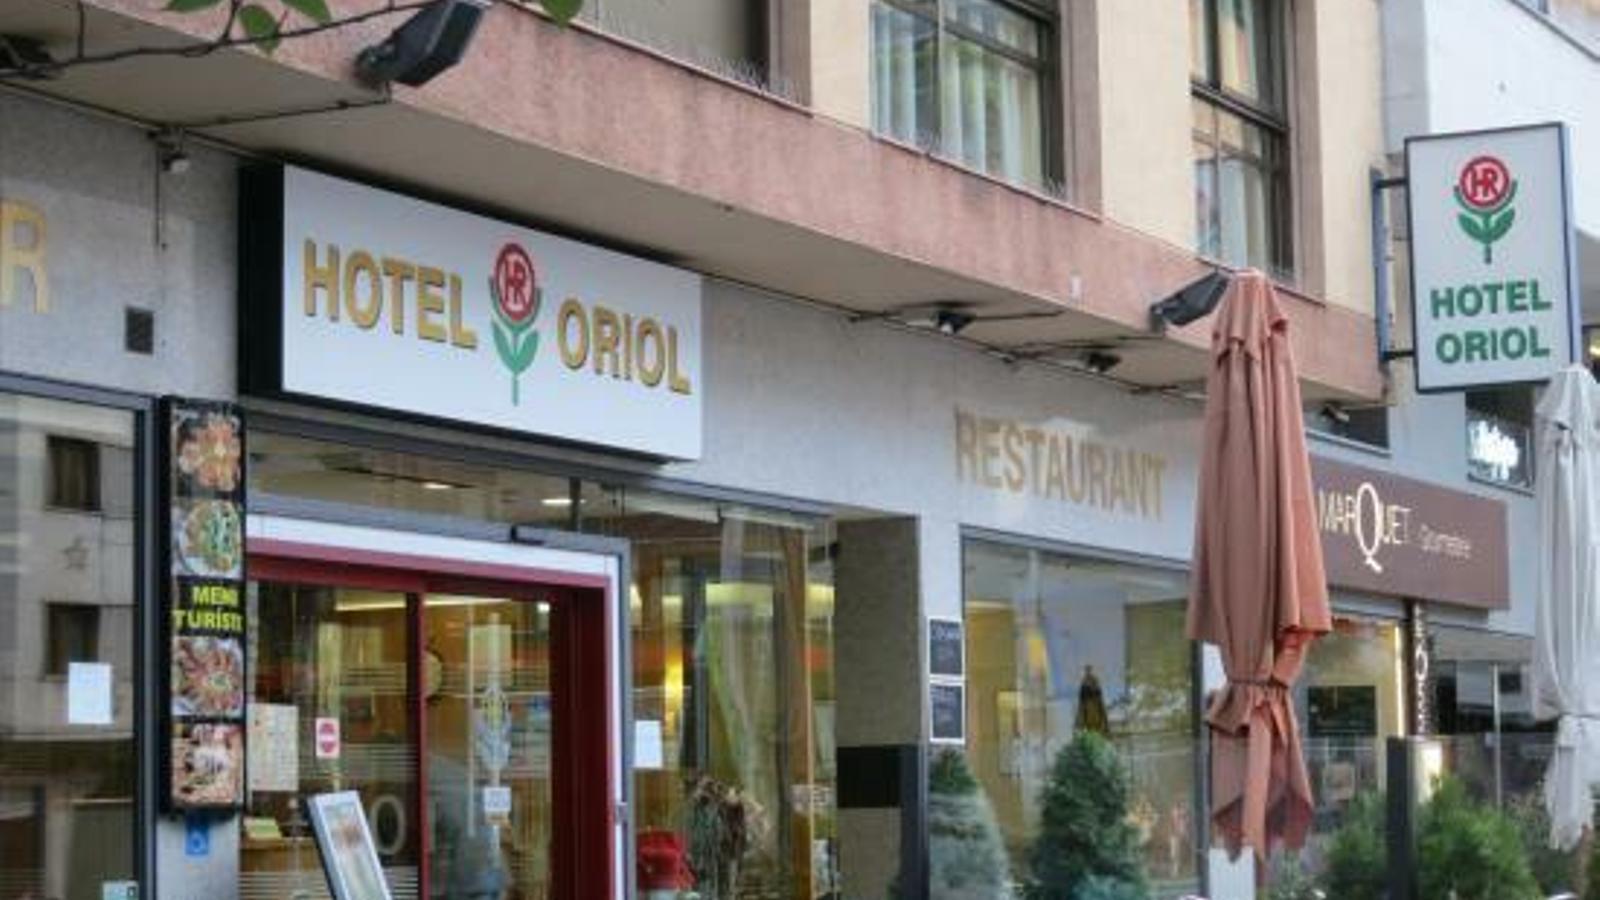 L'Hotel Oriol d'Escaldes. / TripAdvisor